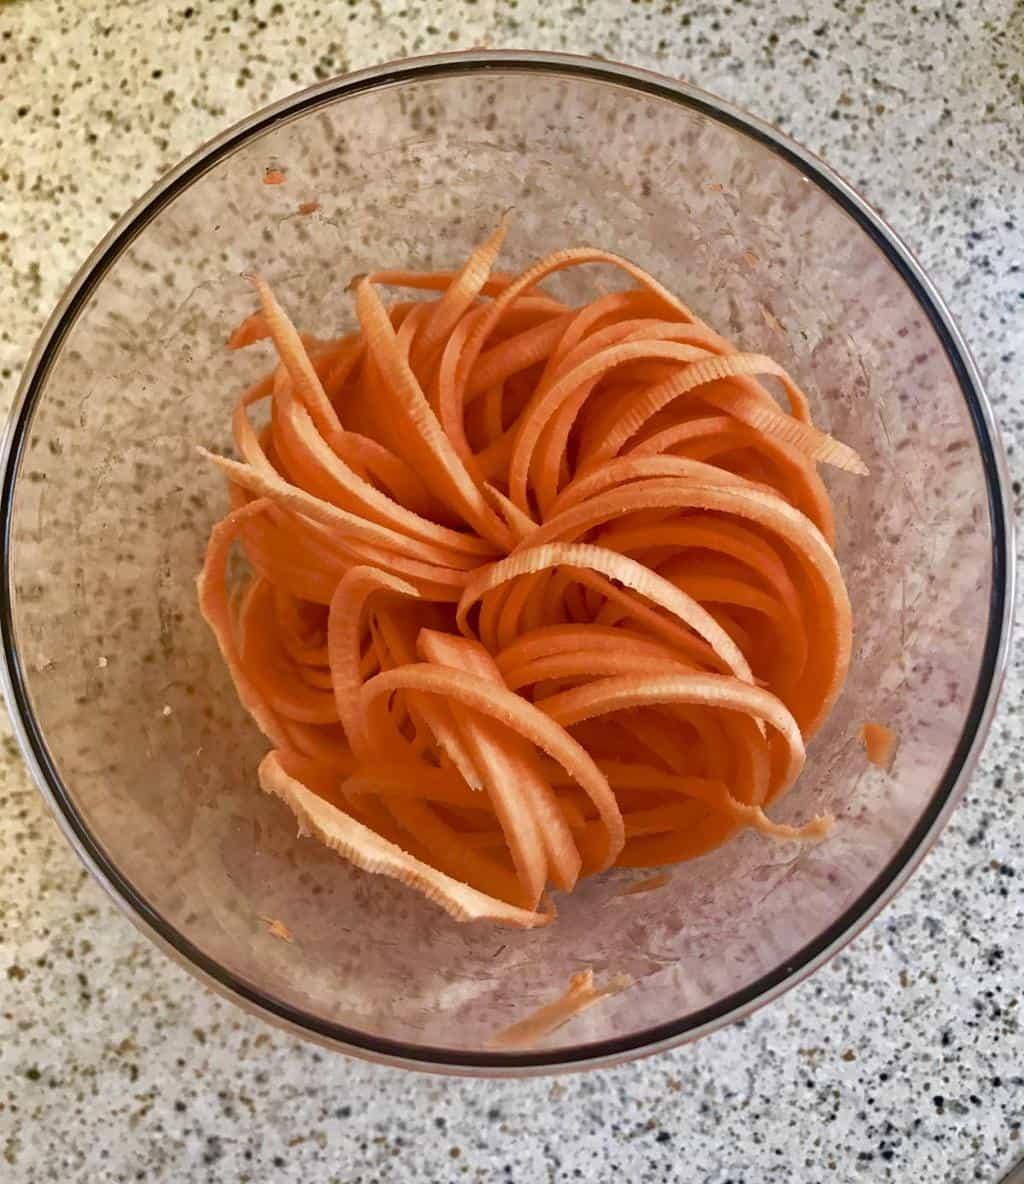 Spiralized sweet potato